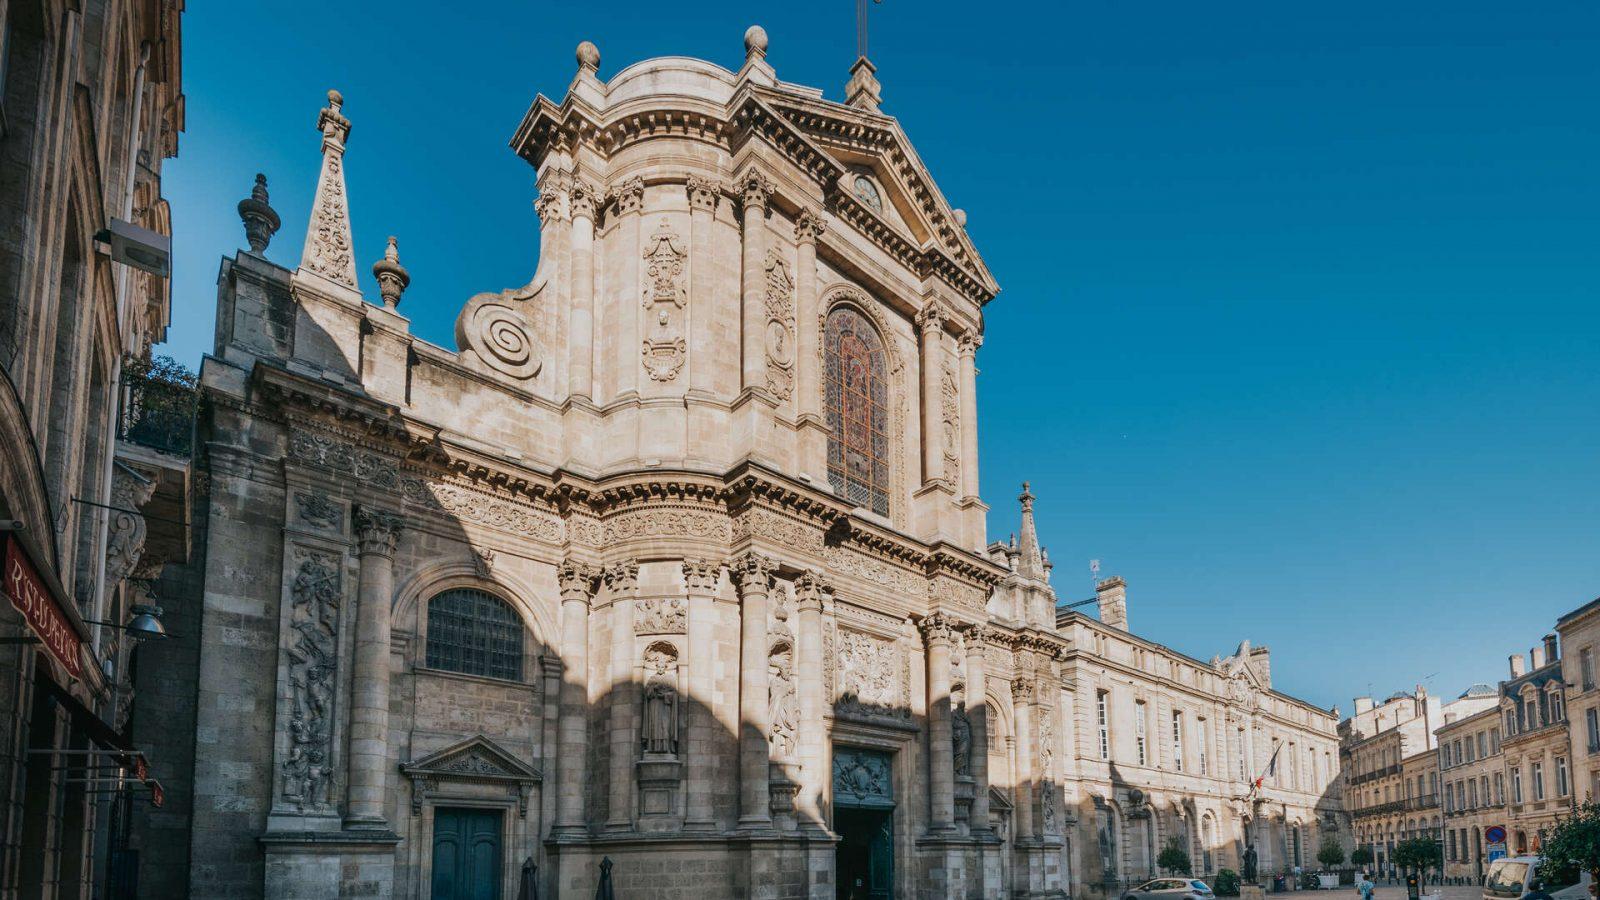 Eglise-Notre-Dame-Nicolas-Duffaure